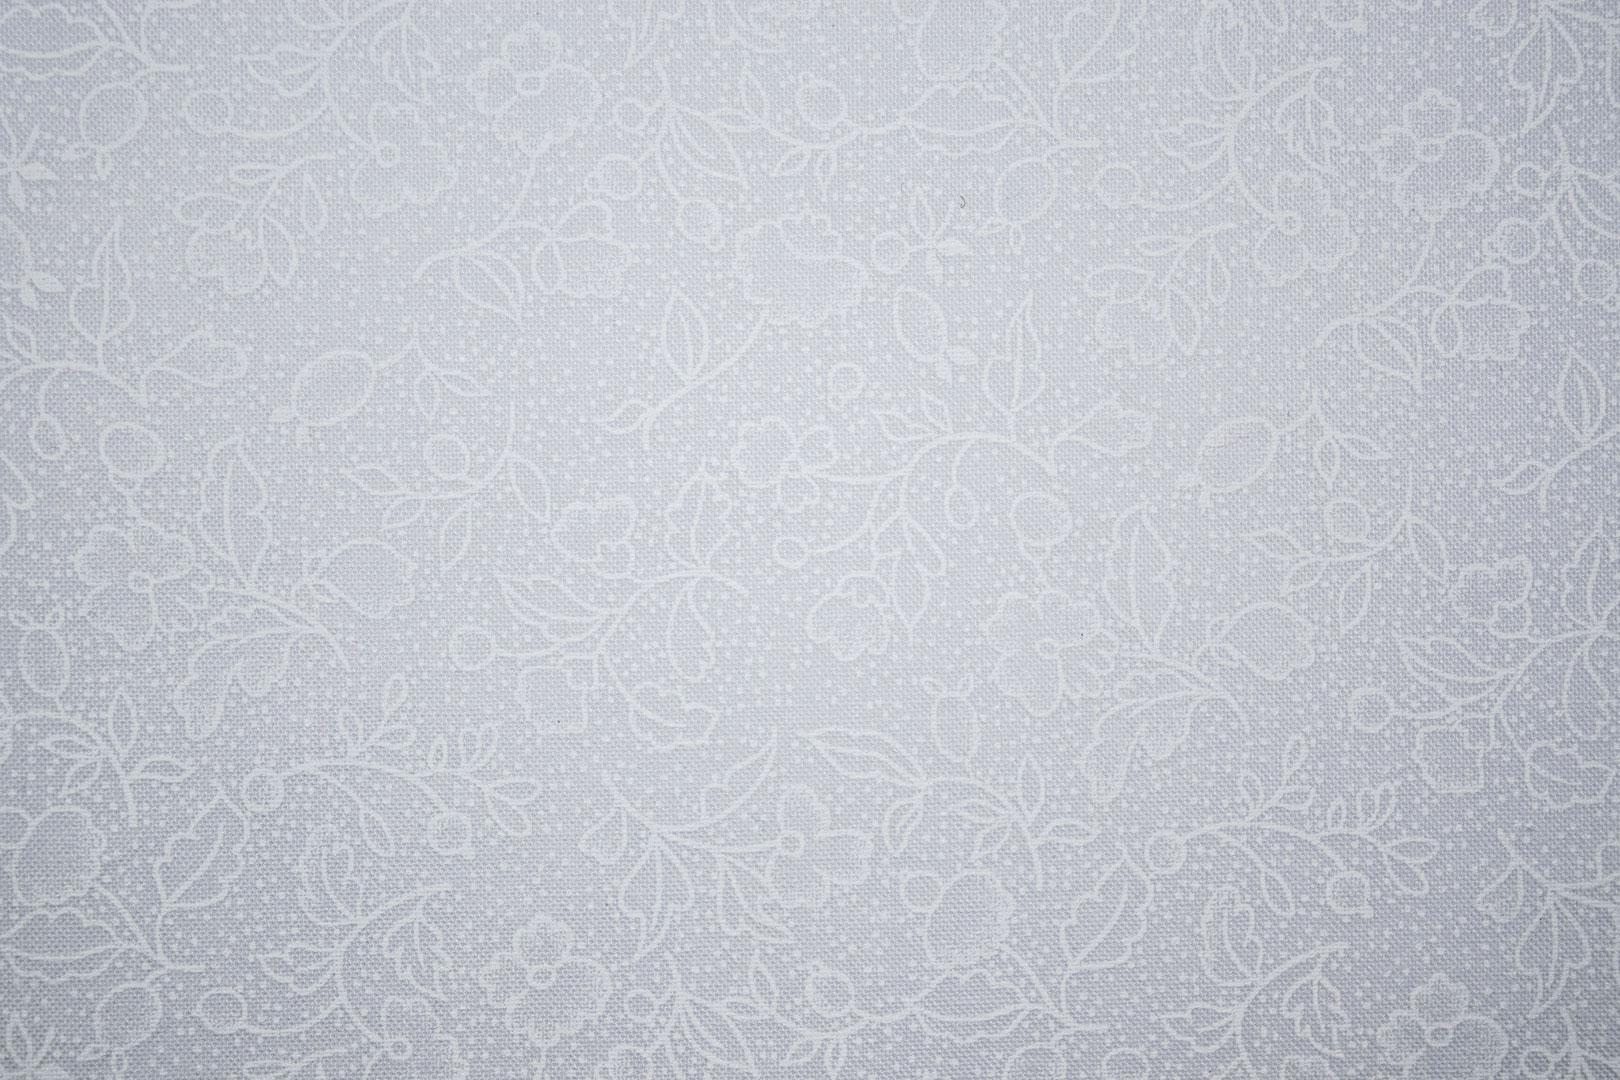 "12_21677_ww   108"" 68/68, 100% Carded Cotton"